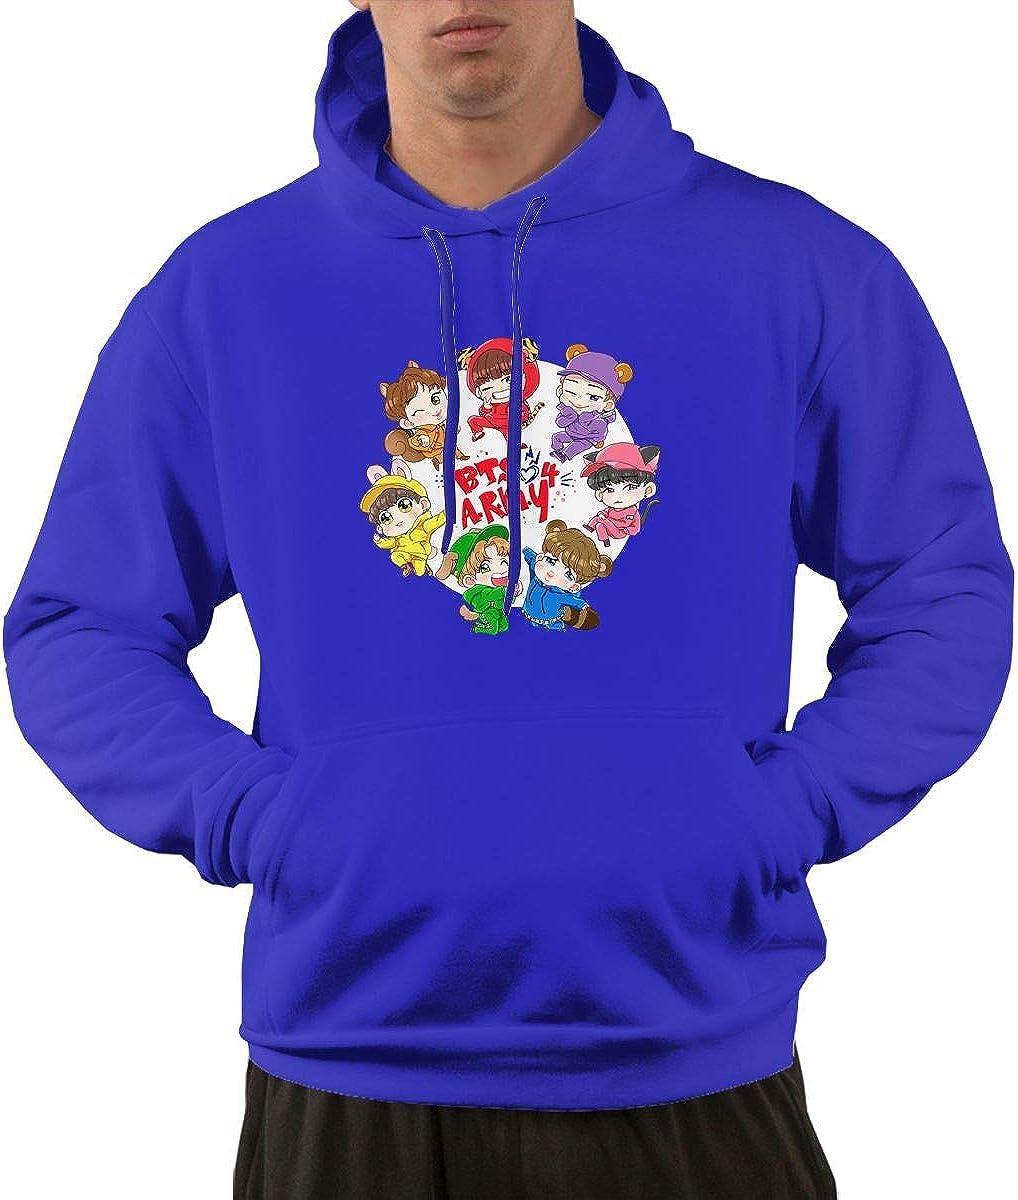 Jurenhq Classic BTS Army Hoodie Sweatshirt for Mans Black